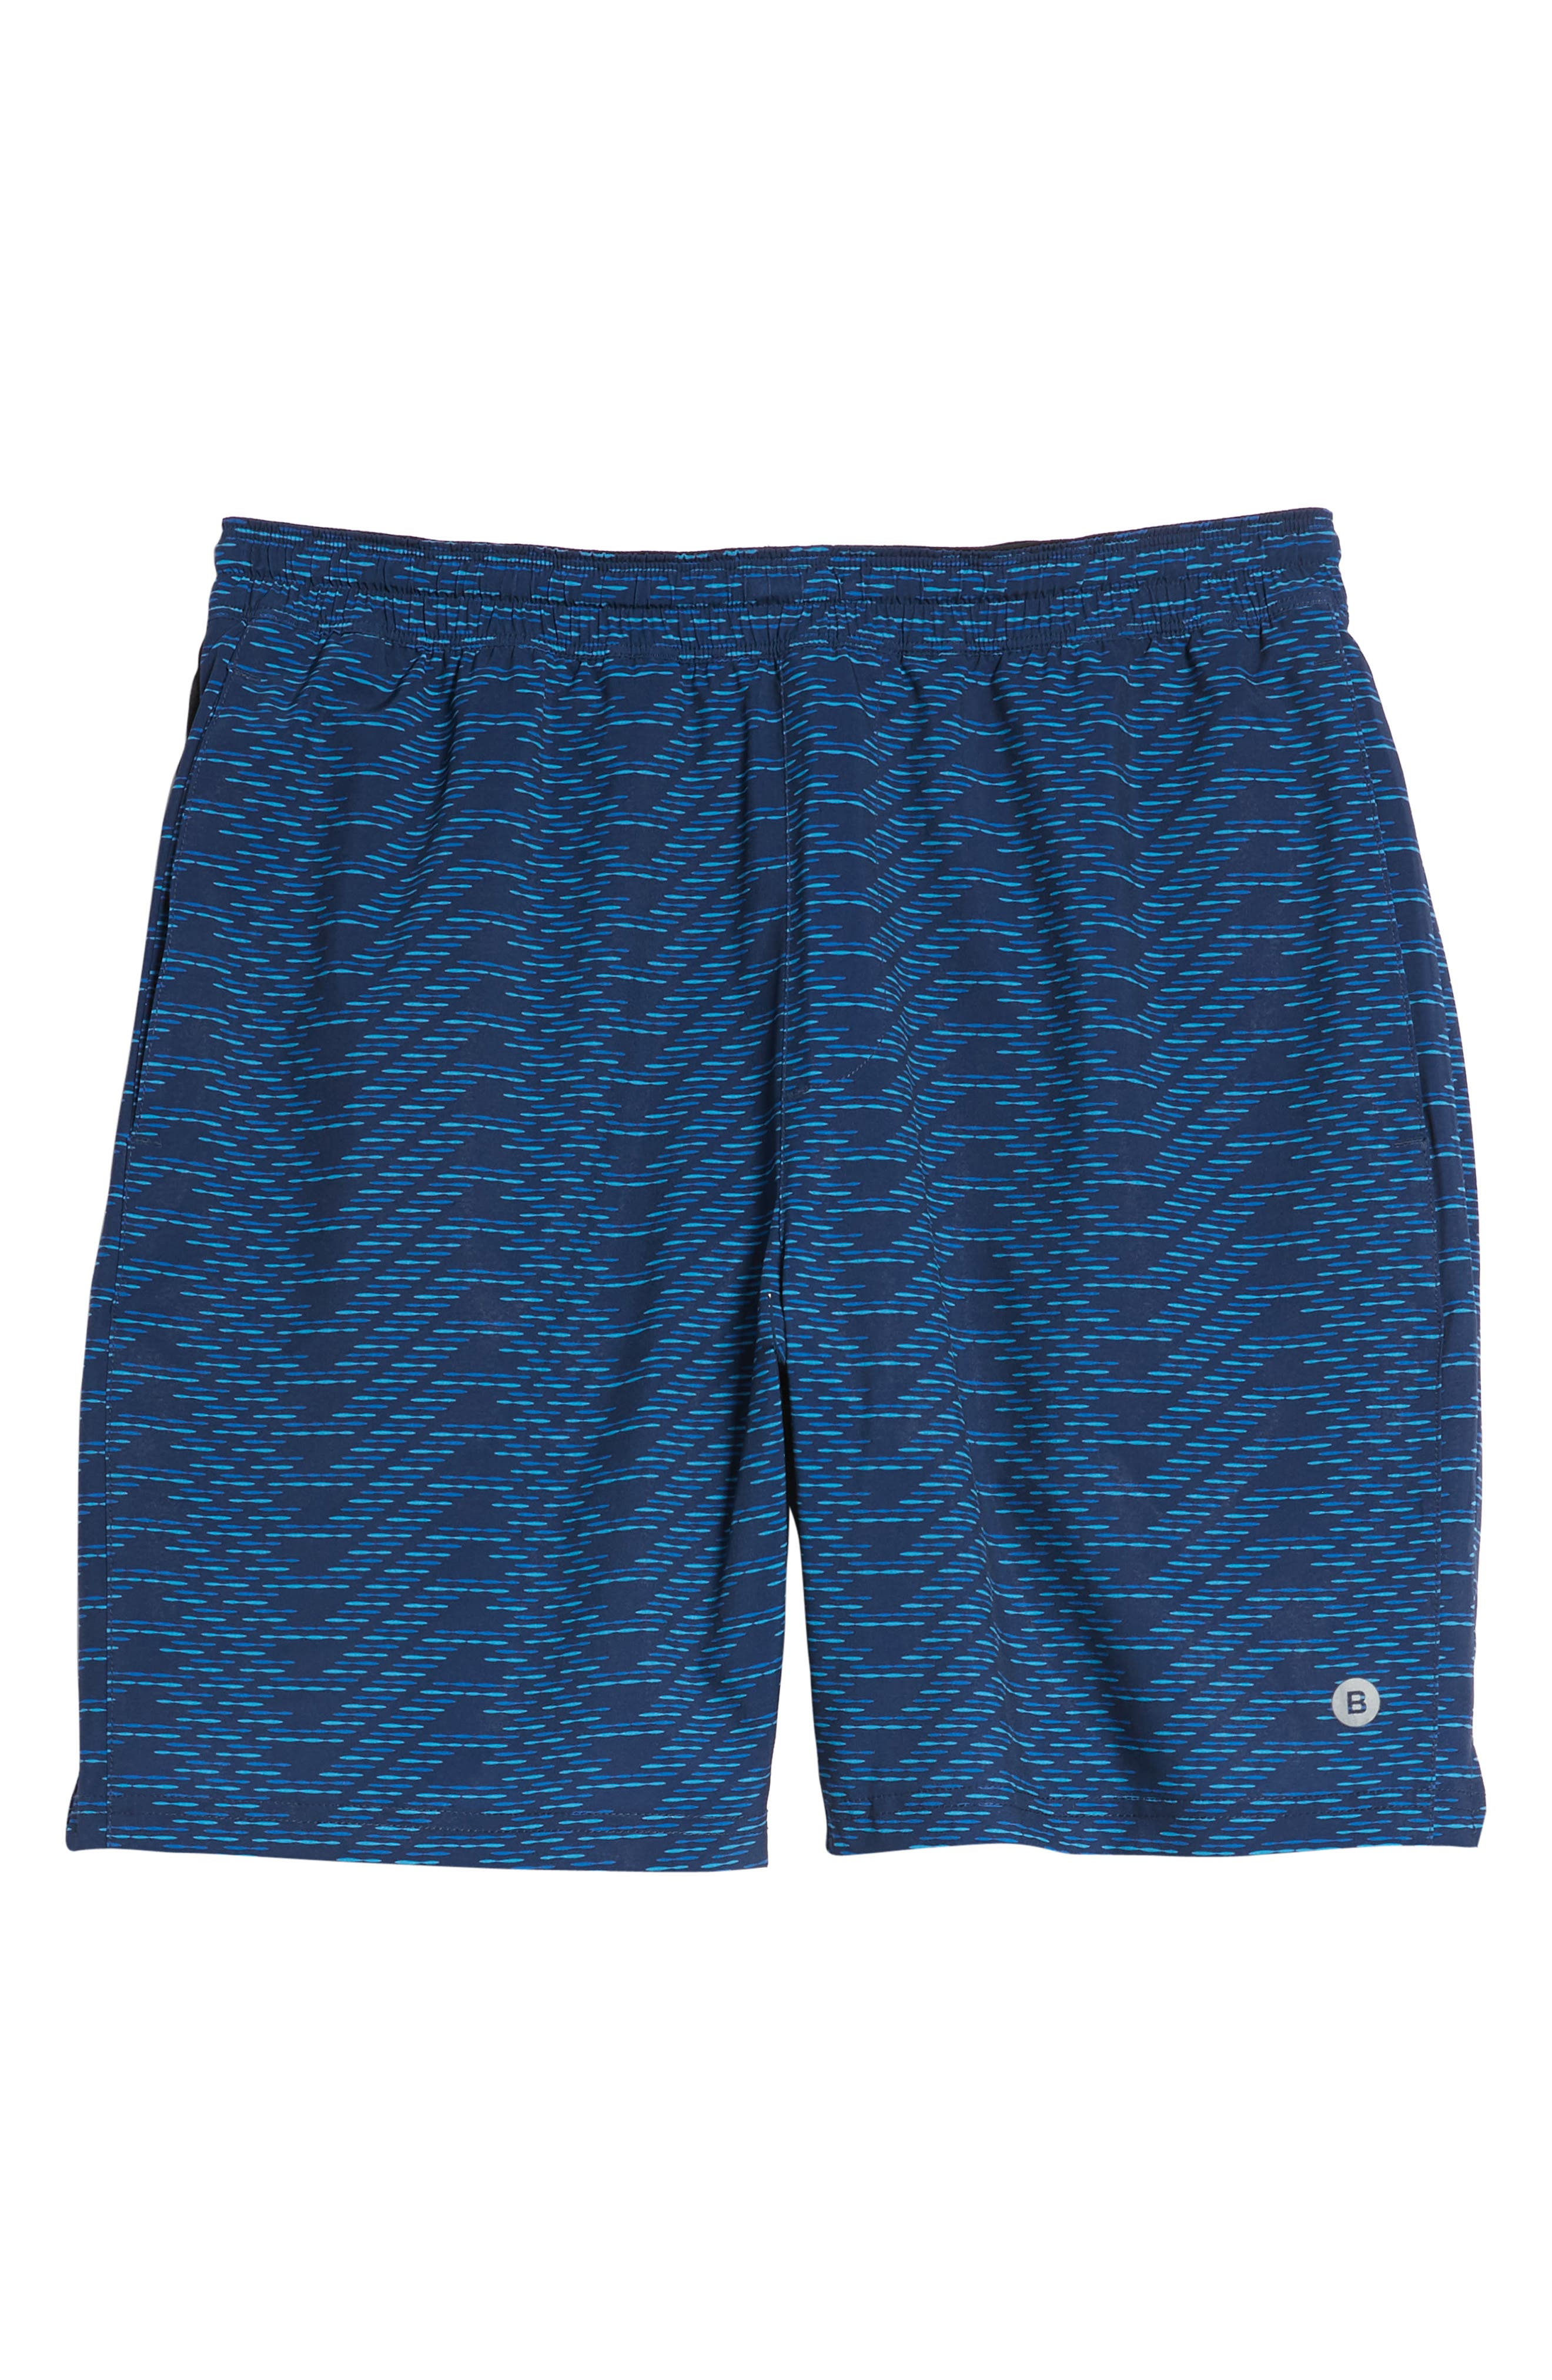 Stretch Shorts,                             Alternate thumbnail 6, color,                             CIRCUIT BREAKER